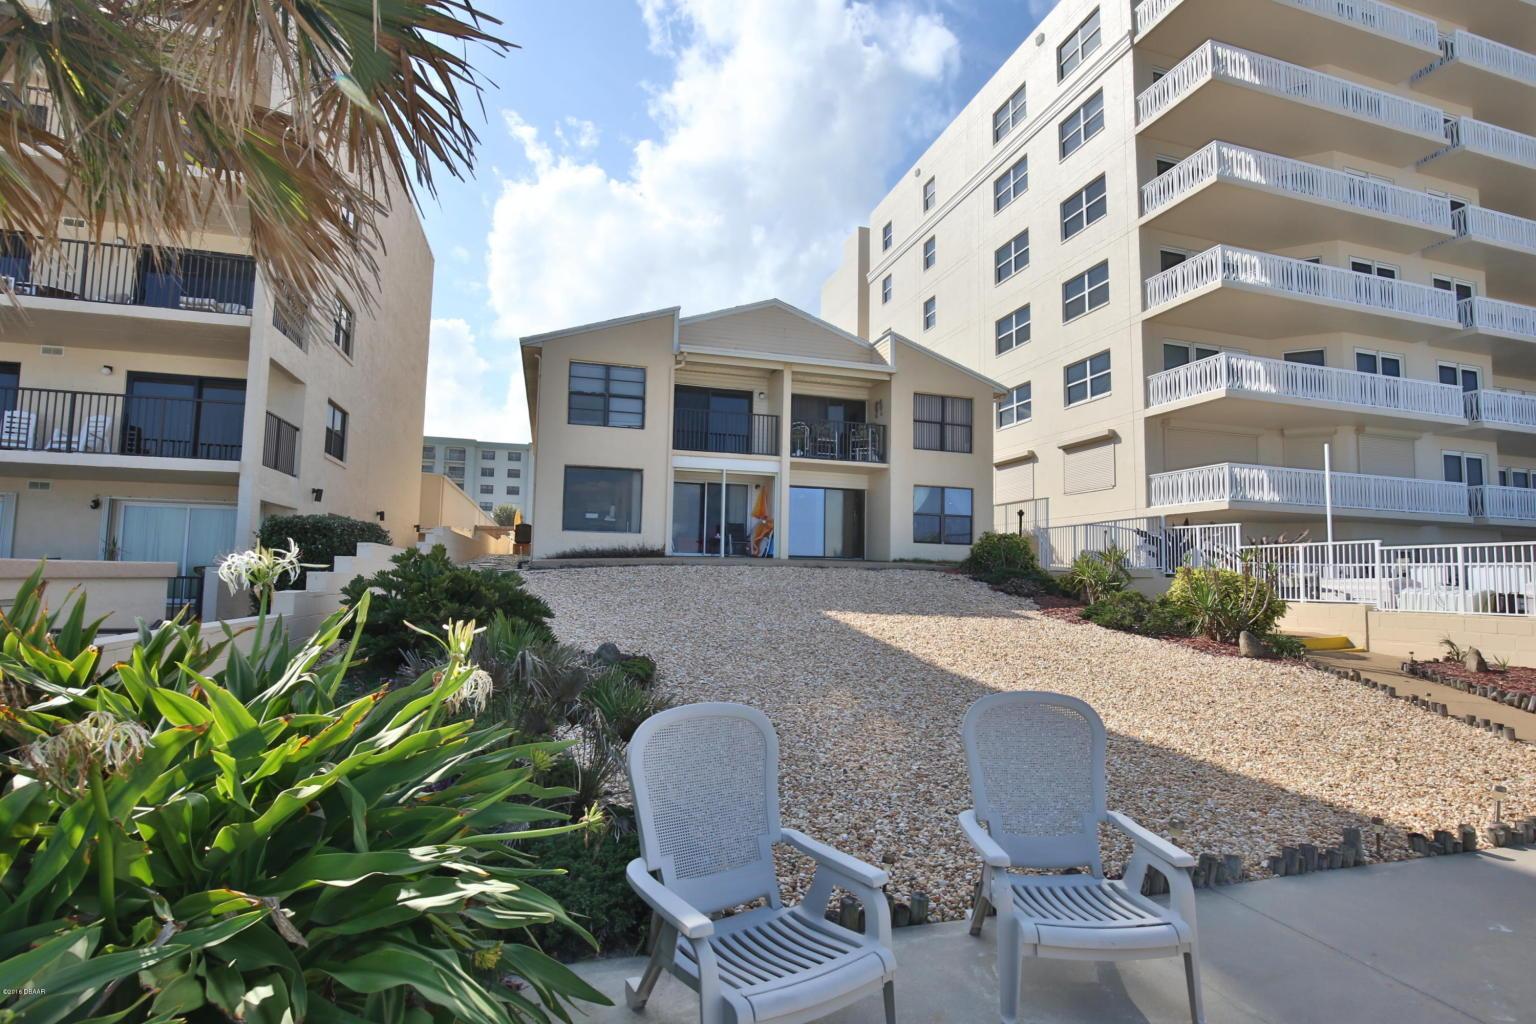 villas by the sea  ocean front condos daytona beach for sale